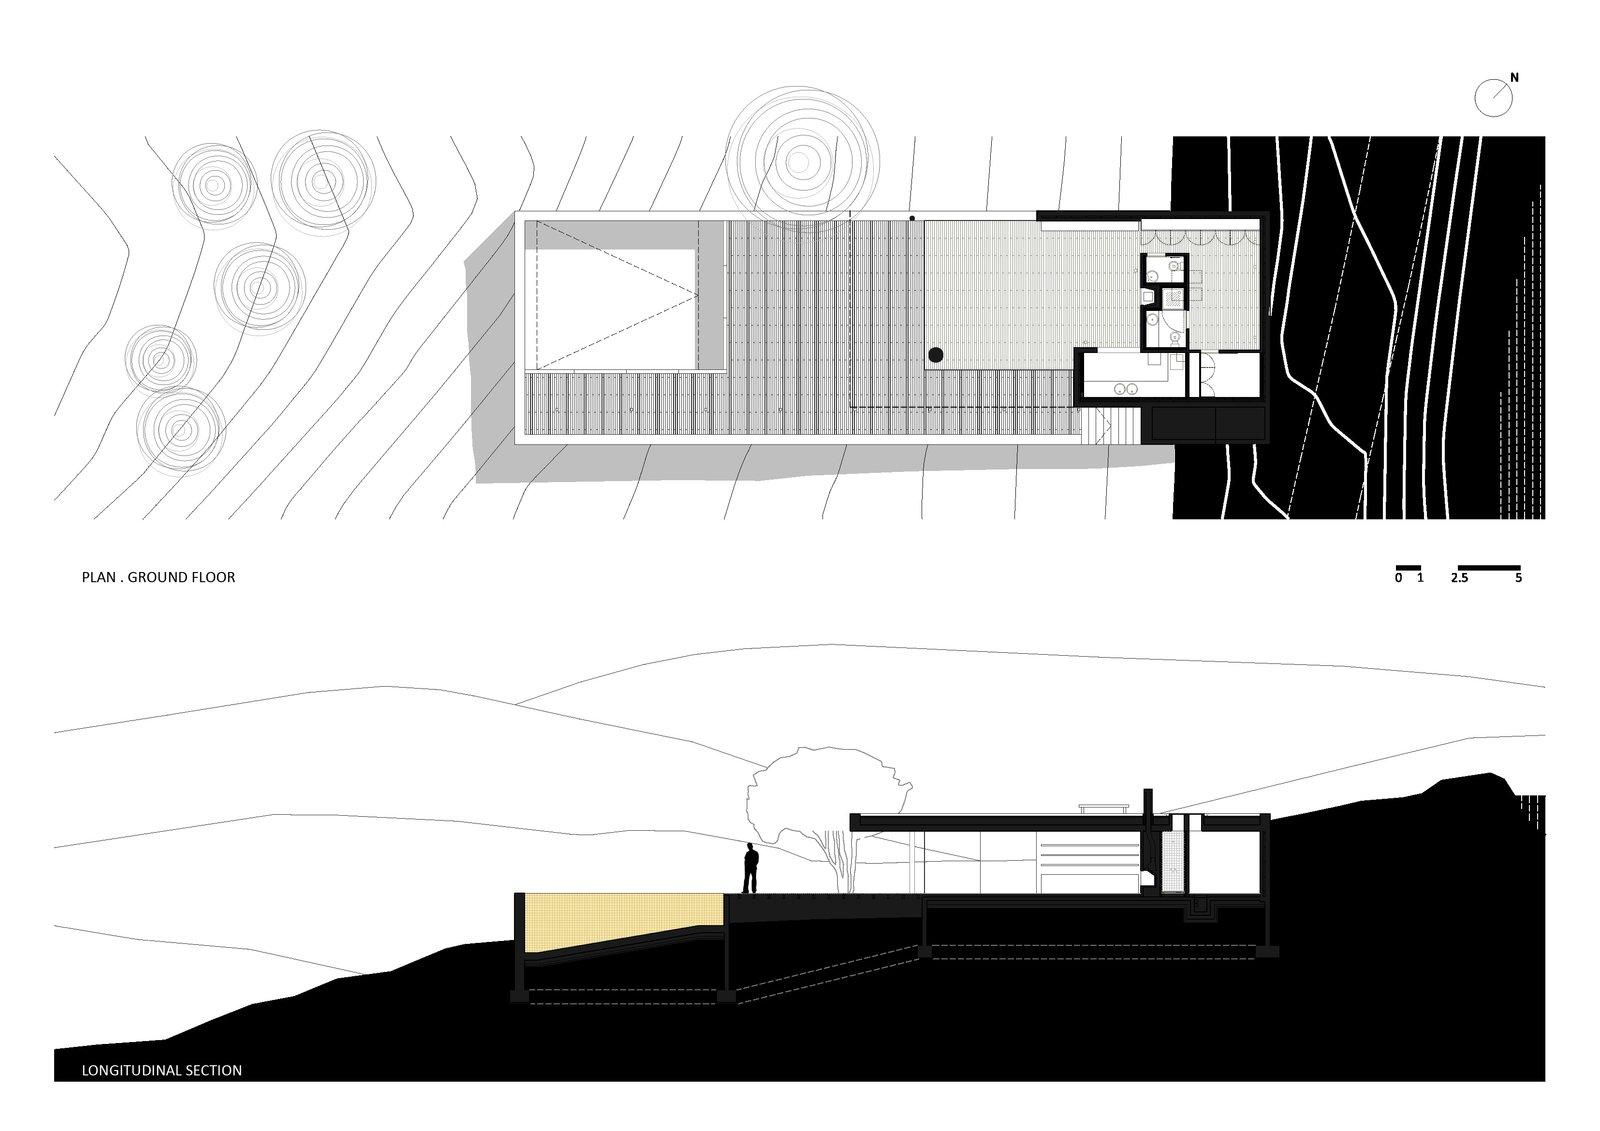 Plan Ground Floor and Longitudinal Section